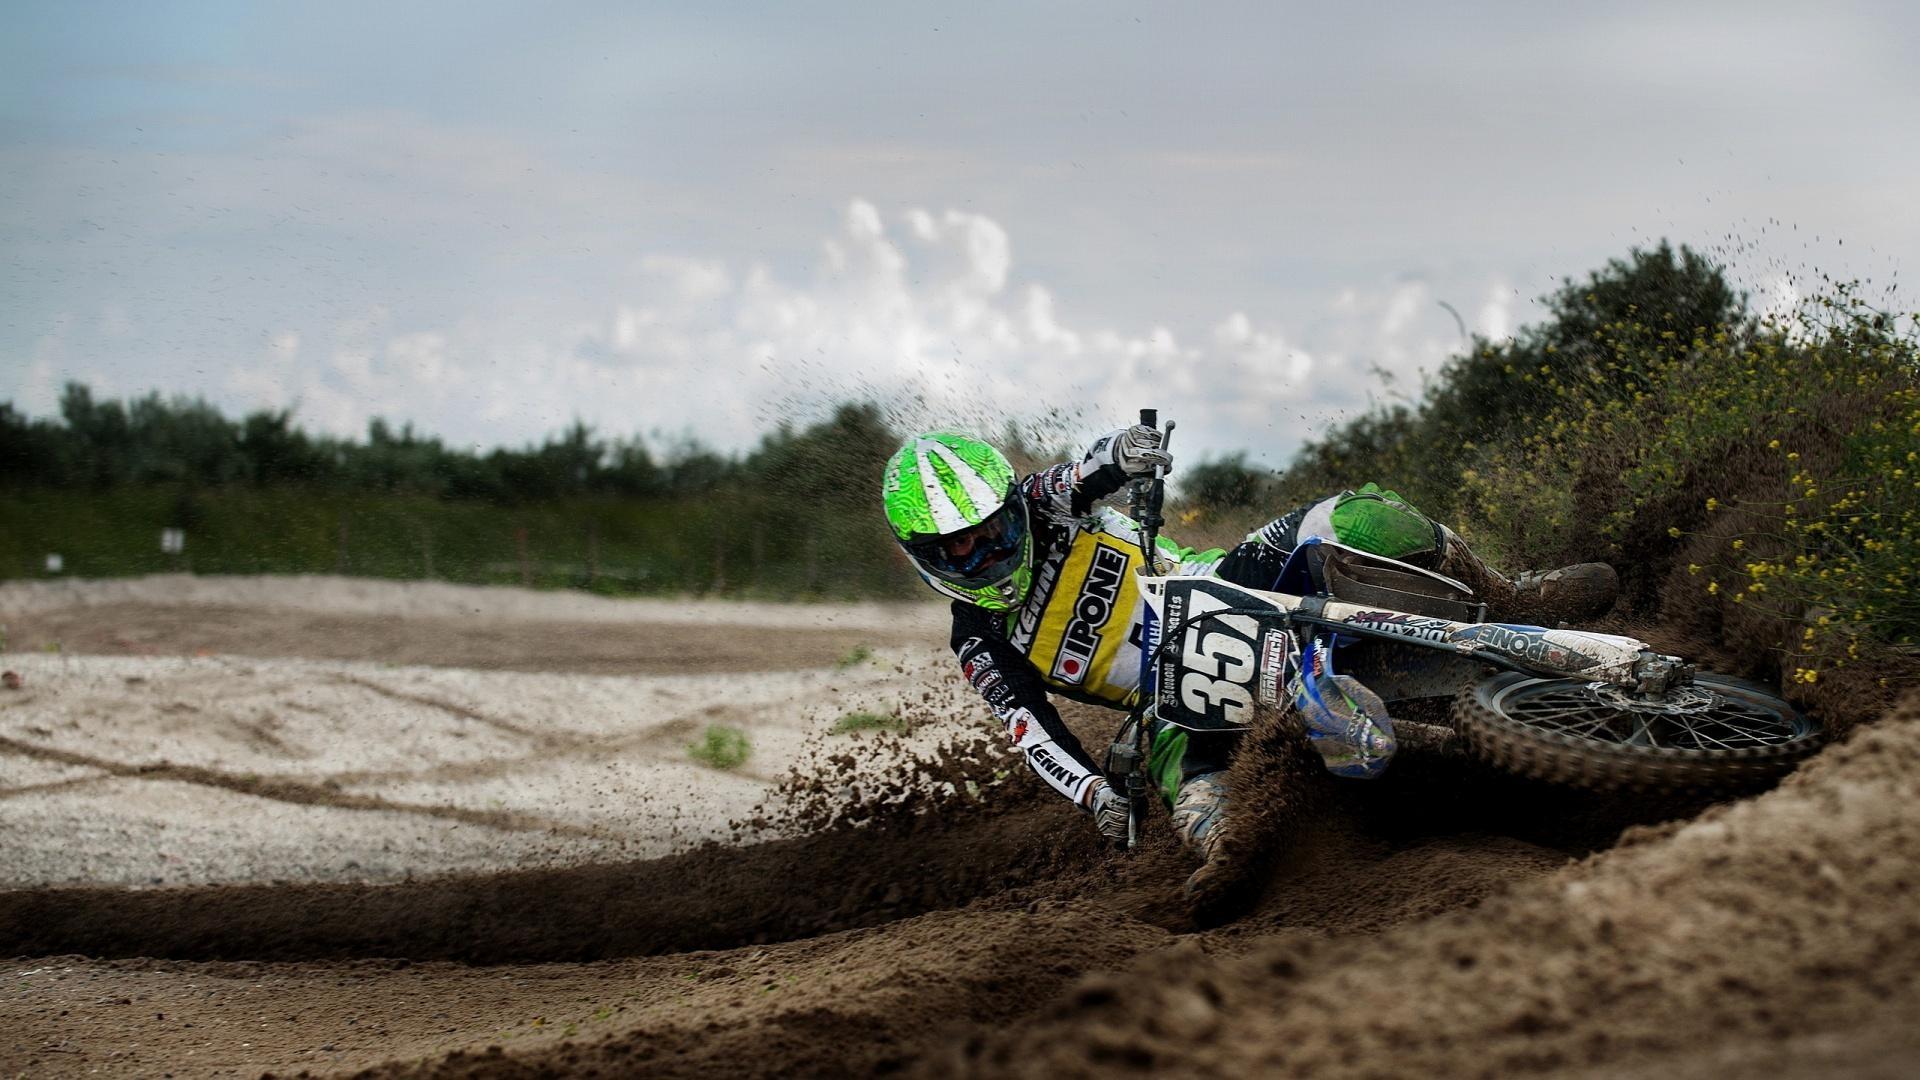 wallpaper.wiki-Download-Dirt-Bike-Wallpaper-HD-PIC-